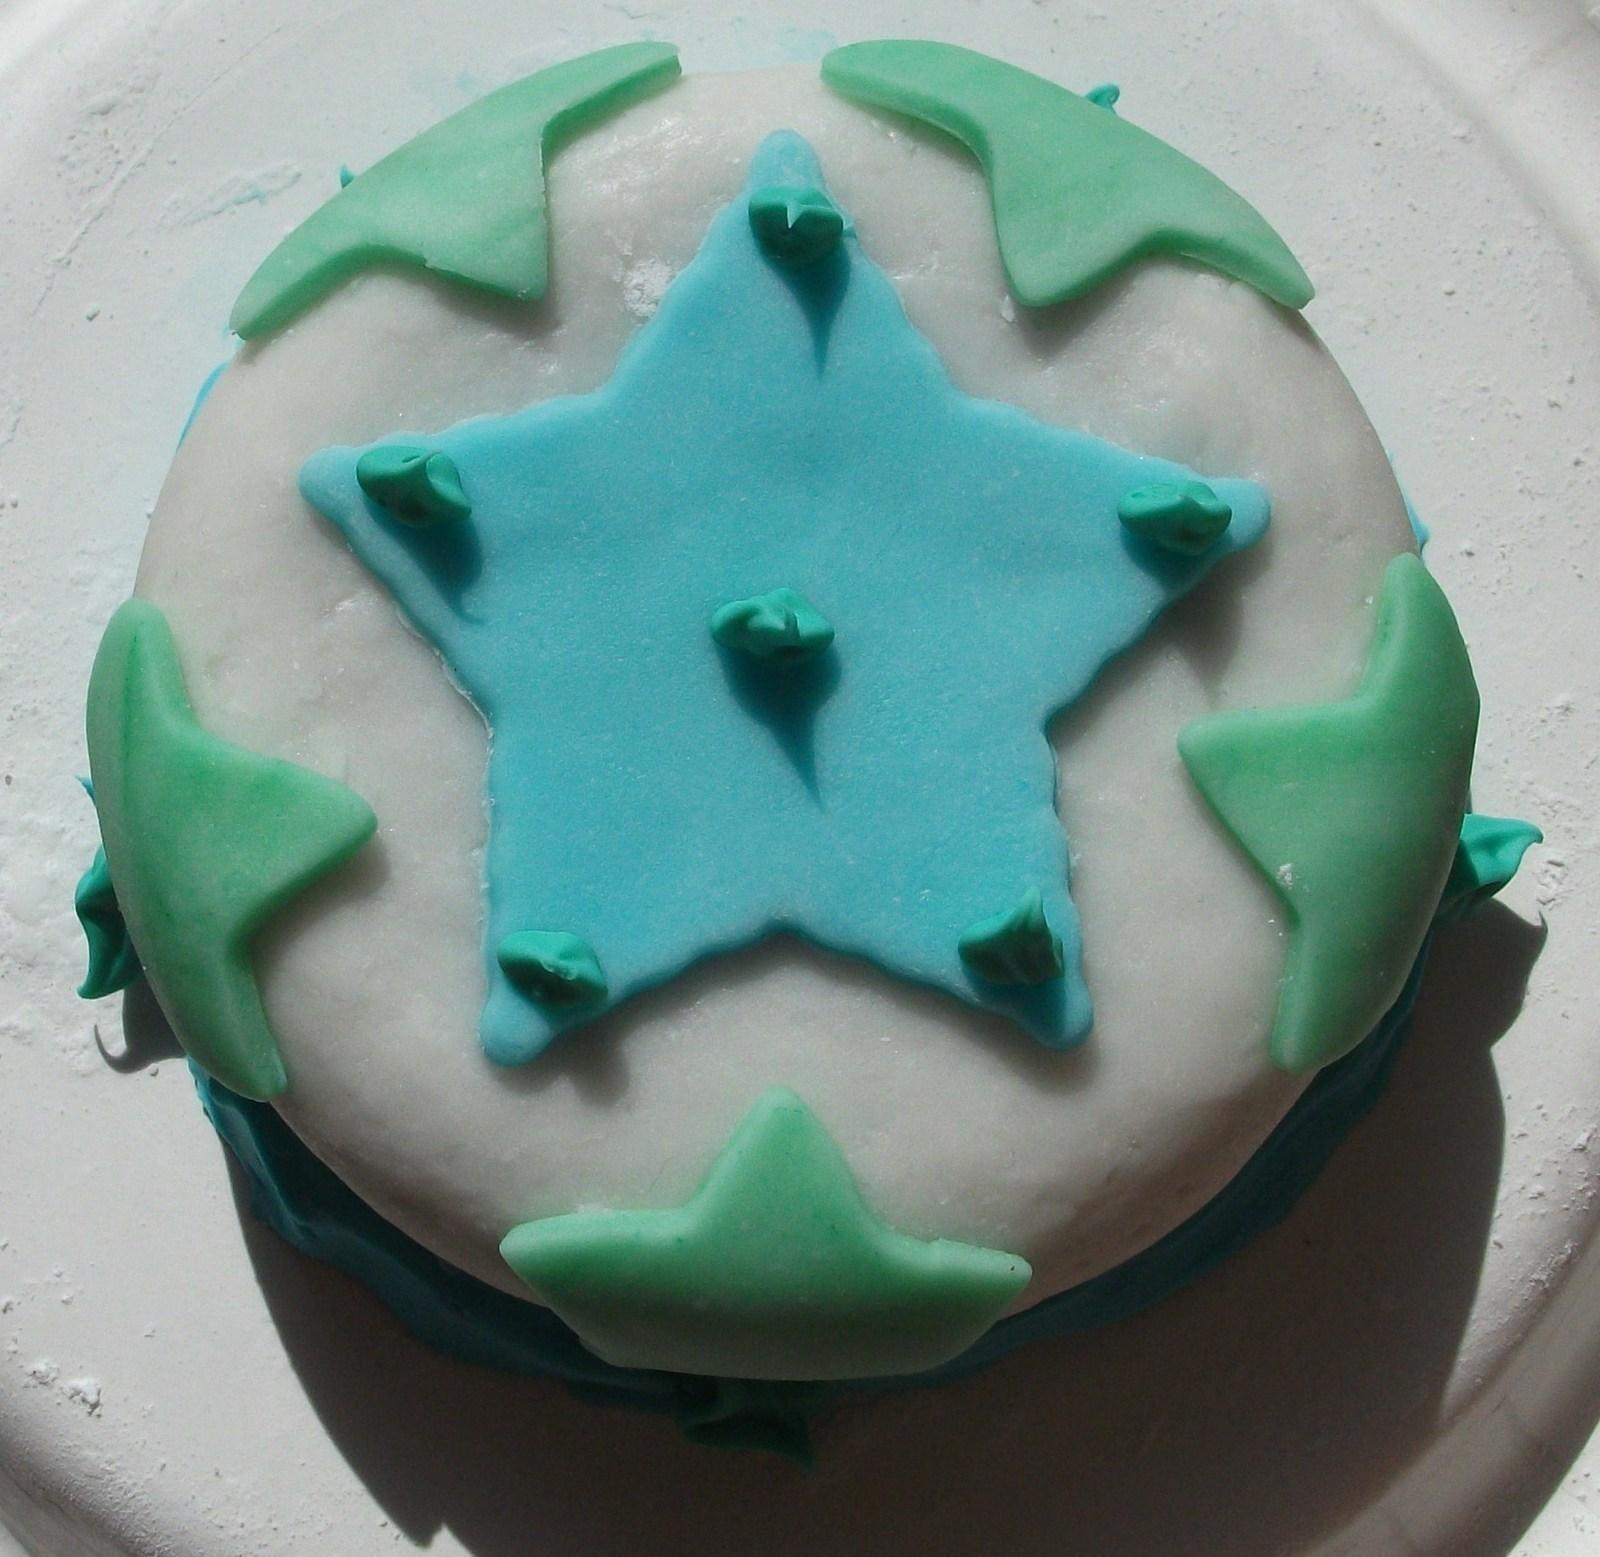 Star Fondant Cake 183 A Patterned Cake 183 Baking Food